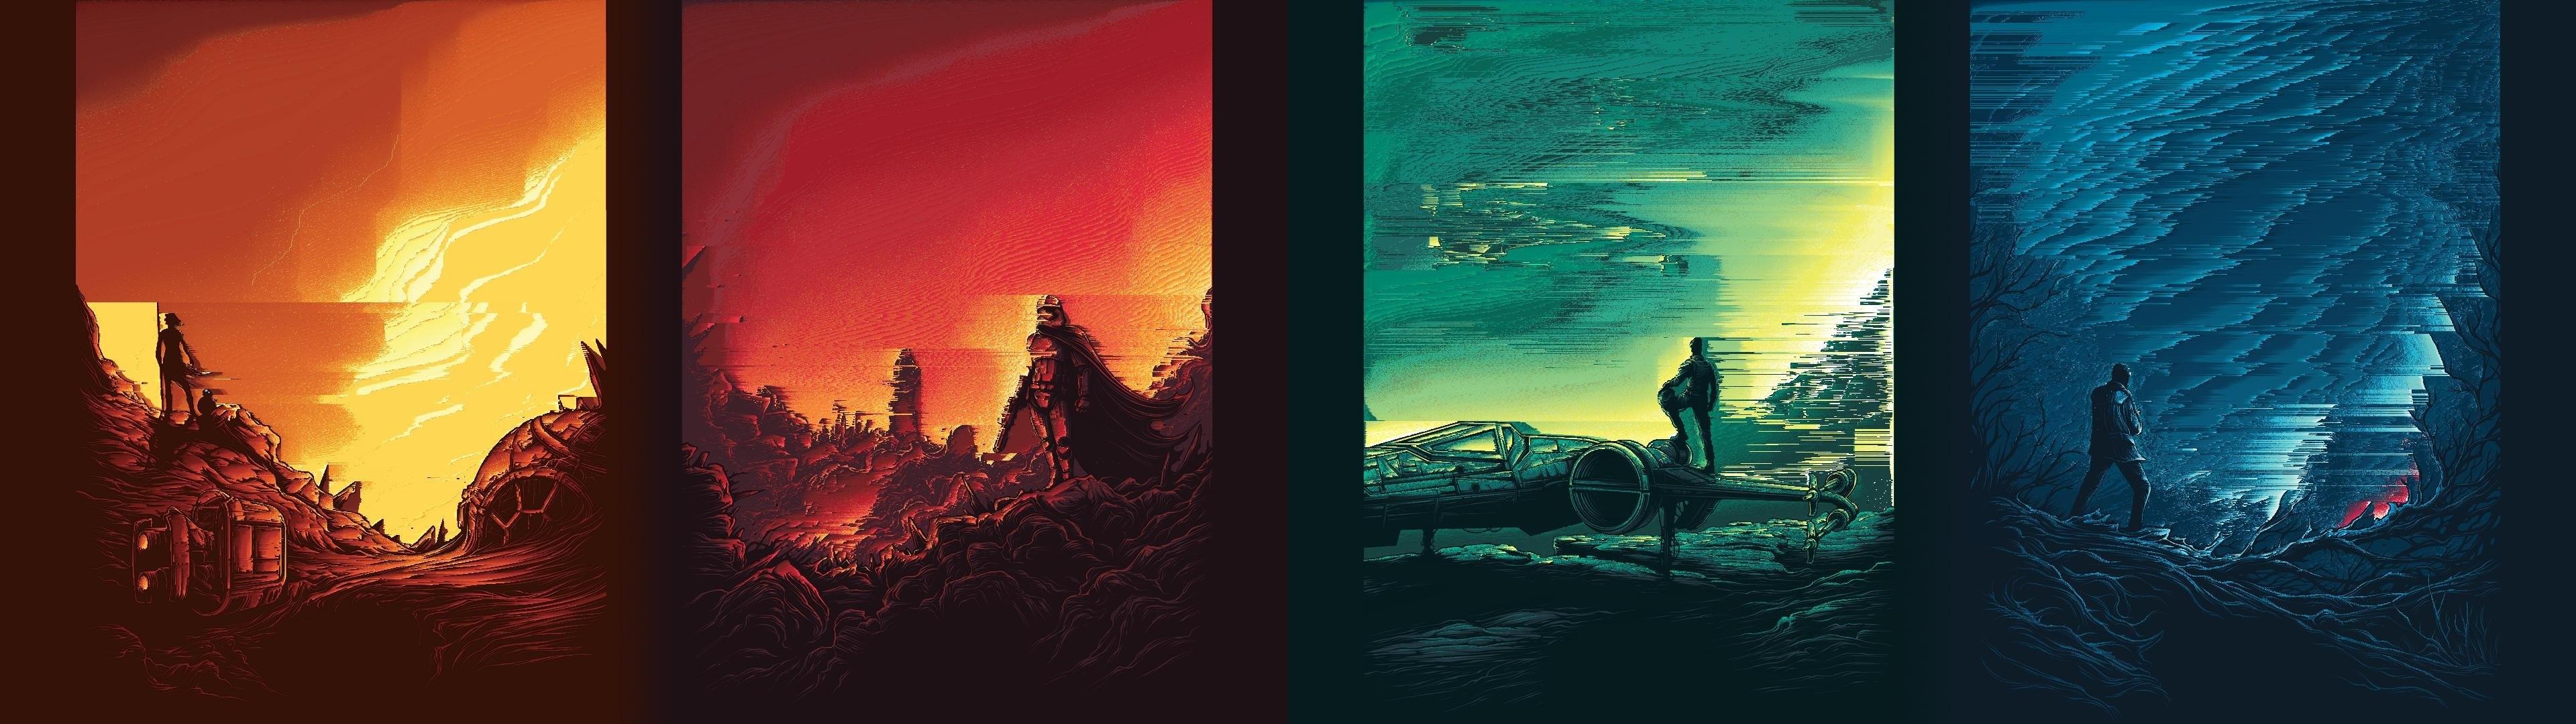 Star Wars Dual Monitor Wallpaper Hd 3840x1080 Download Hd Wallpaper Wallpapertip